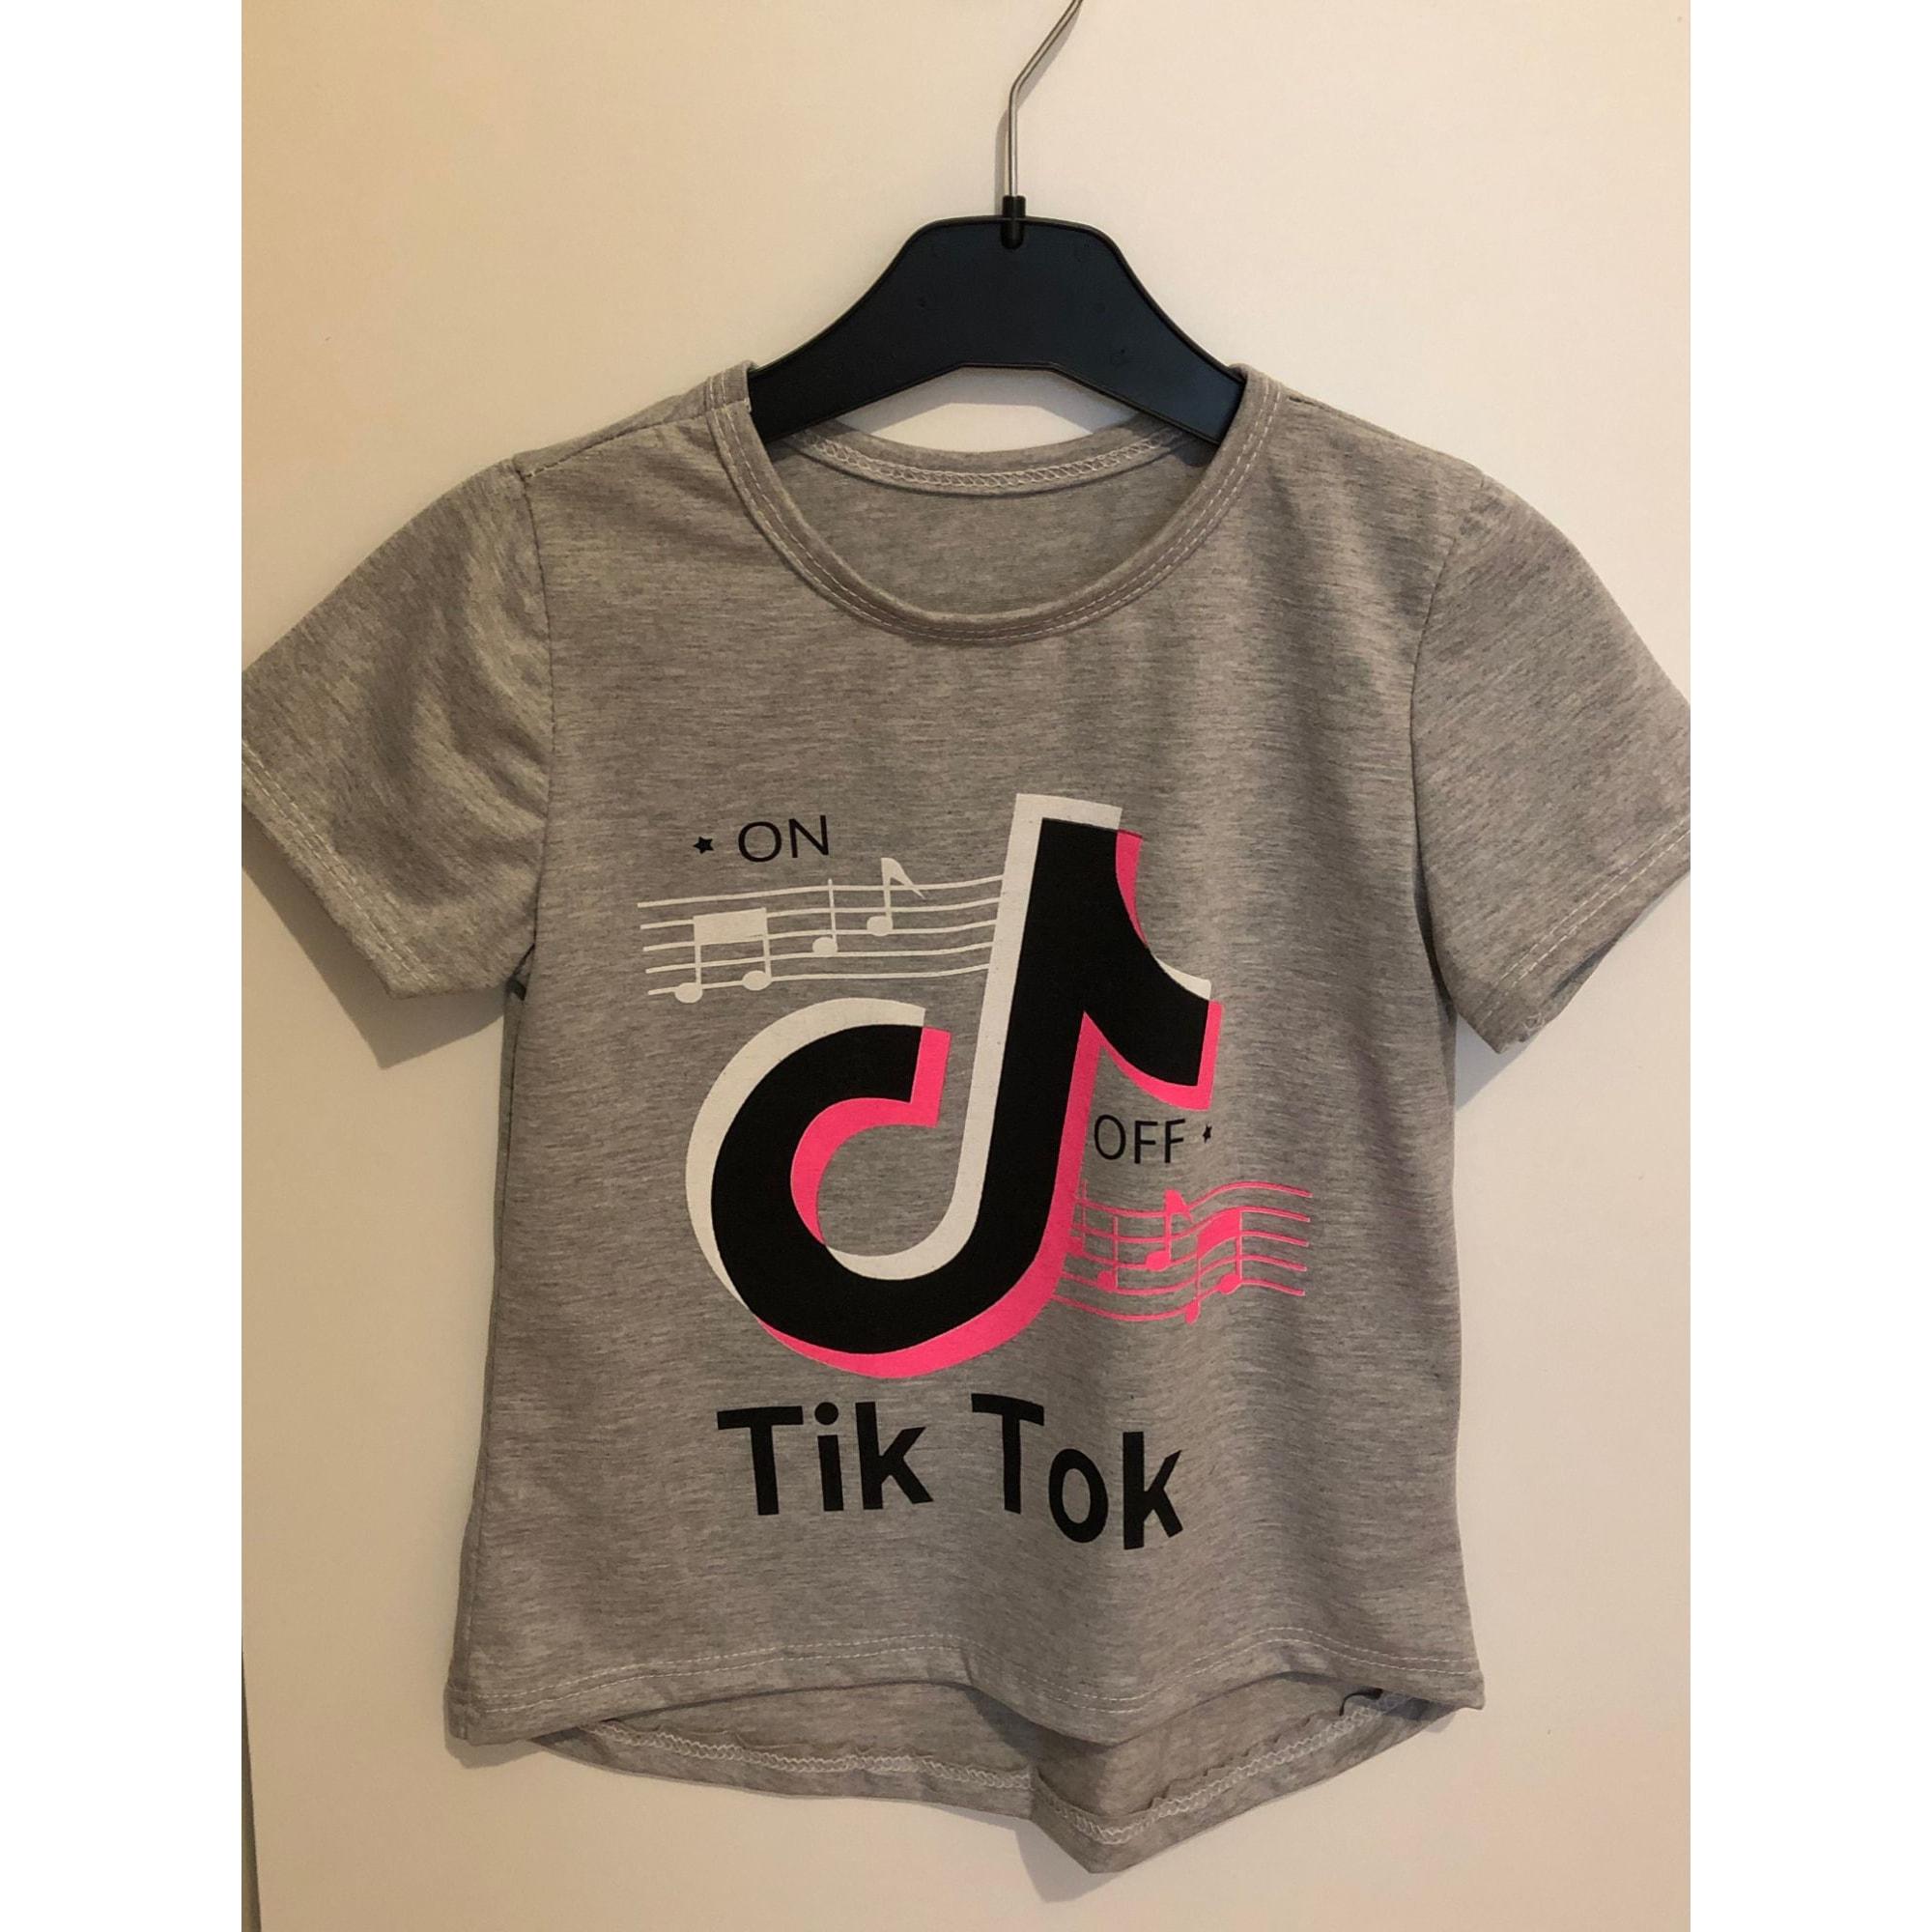 Top, Tee-shirt TIKTOK Gris, anthracite